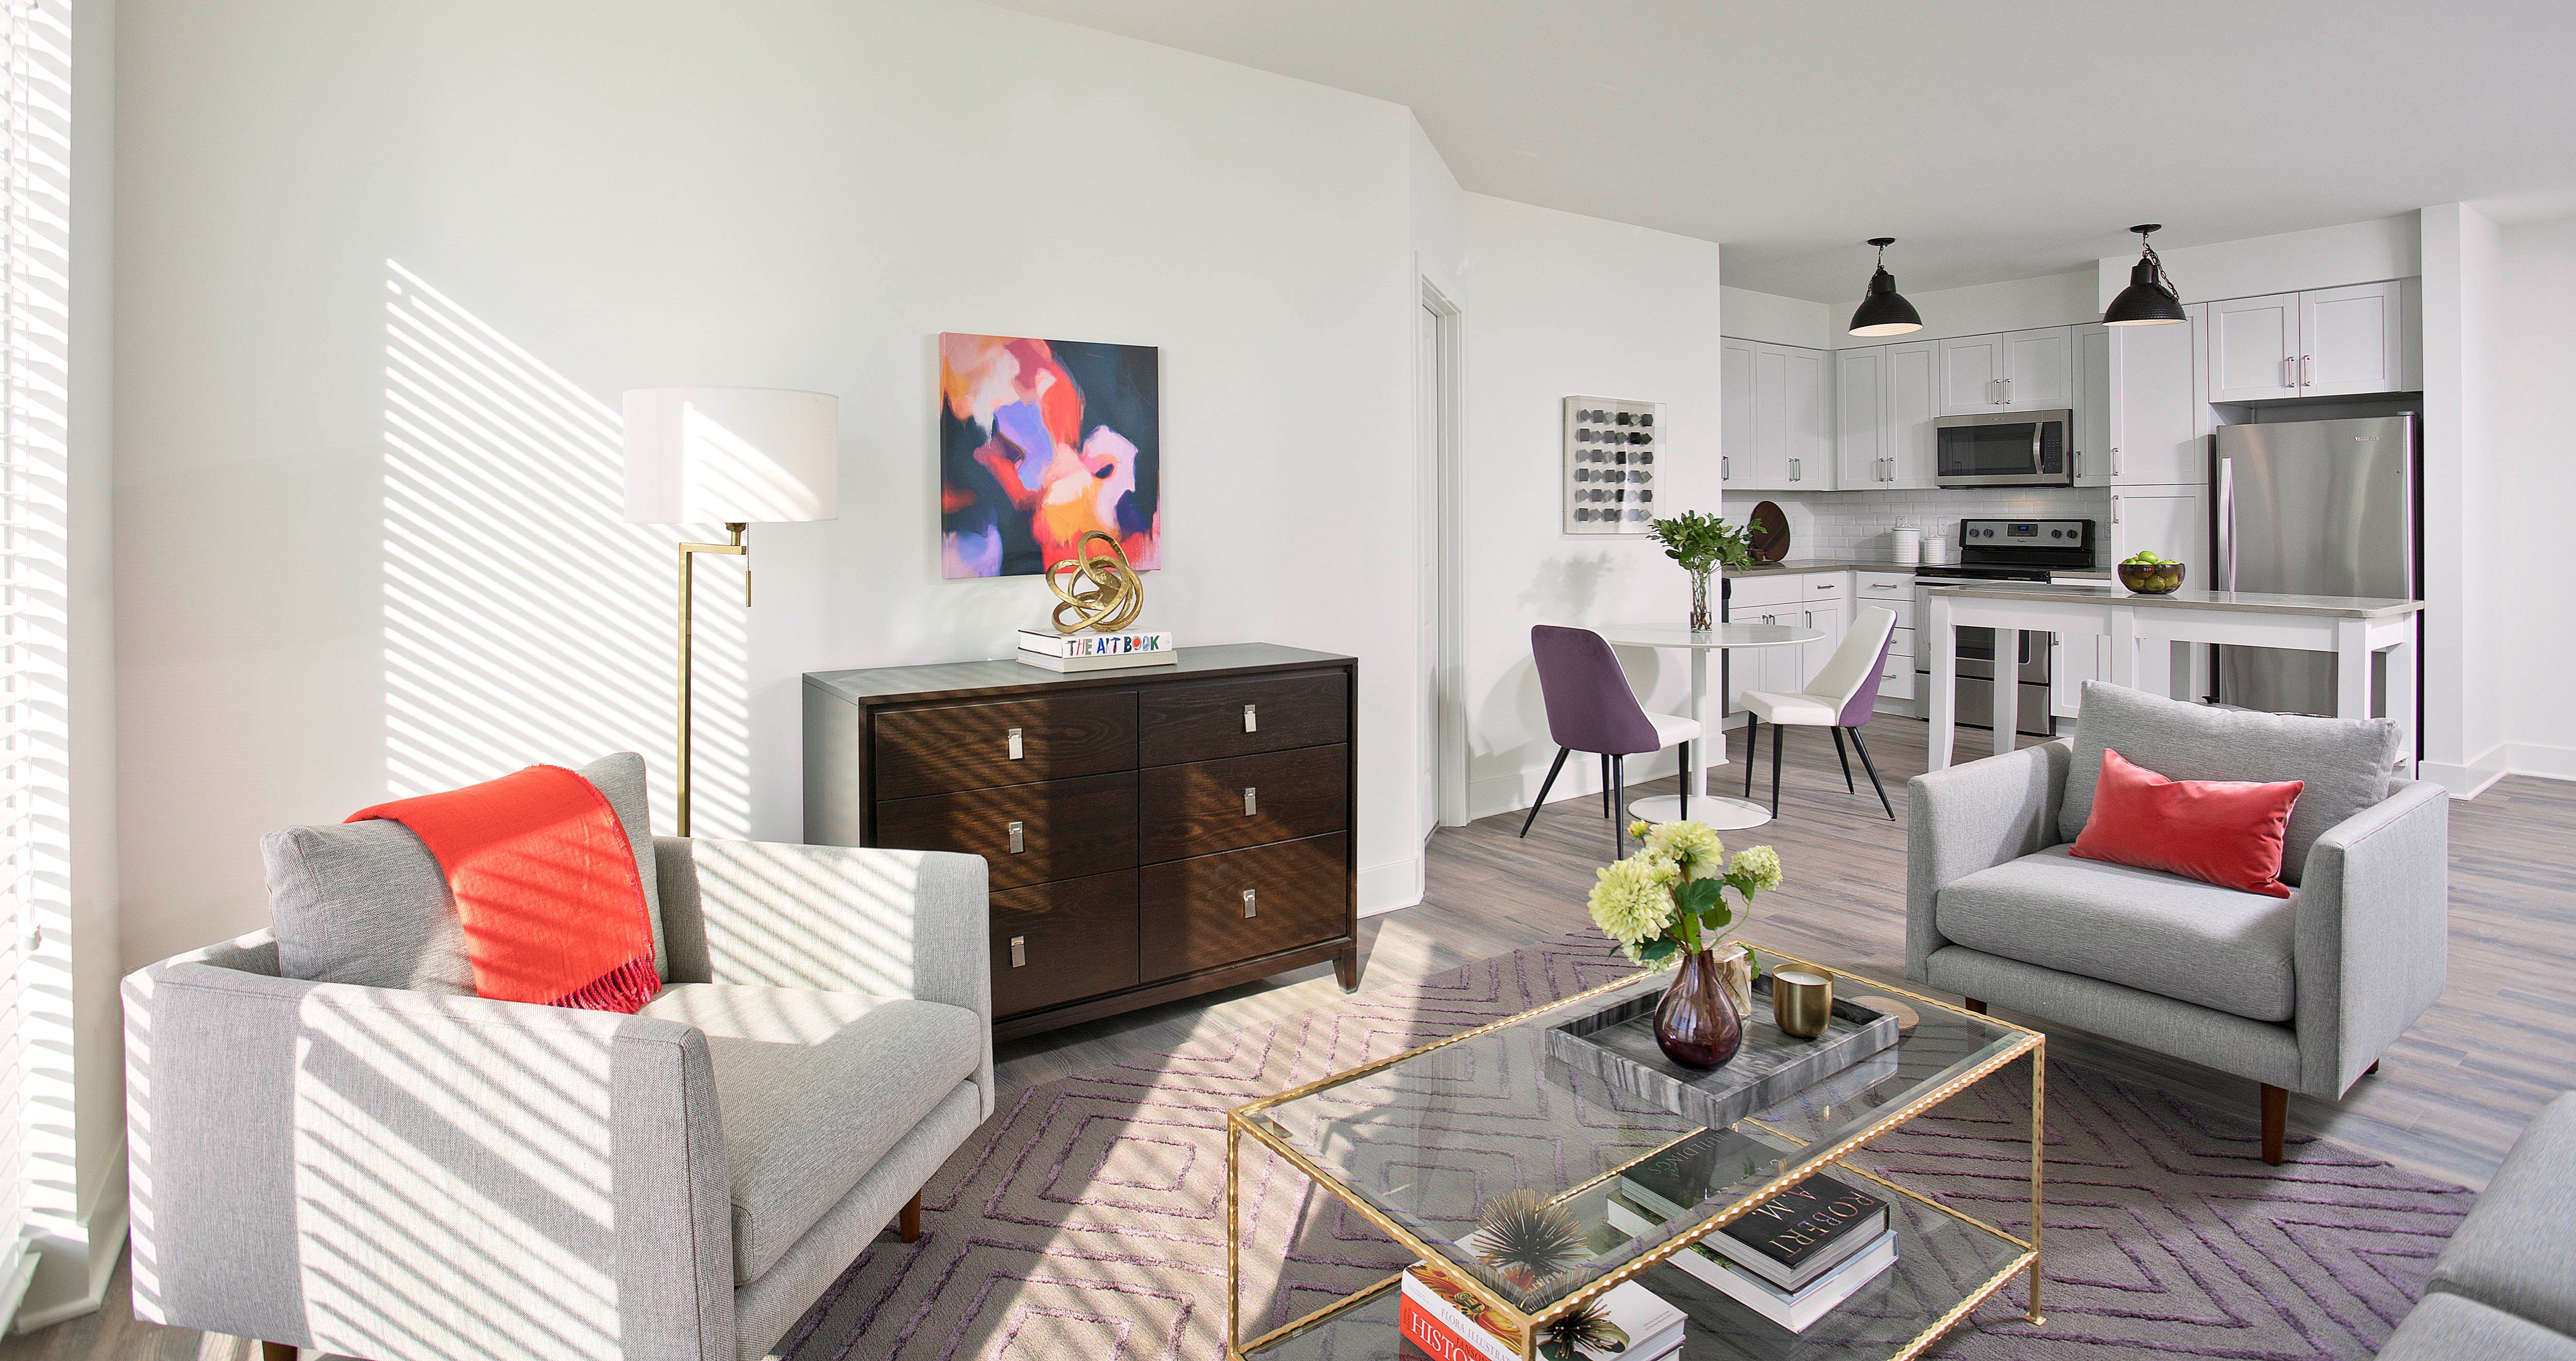 The Thornton Alexandria Va Ava Dsgn Spartansurfaces Floorscore Lvt Luxury Apartments Virginia Apartments Multifamily Housing